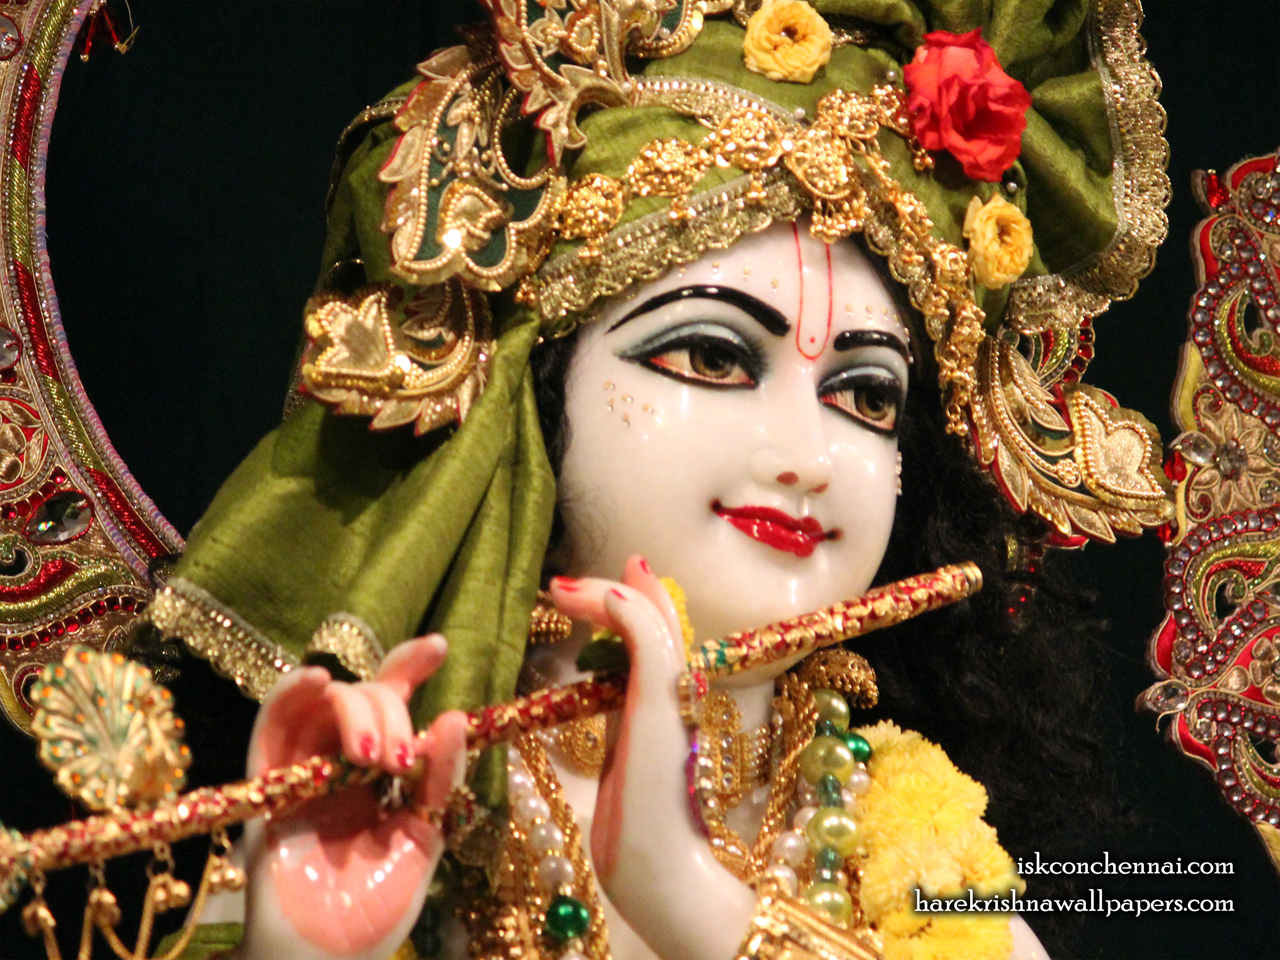 Wallpaper download krishna - Wallpaper Download Krishna 69